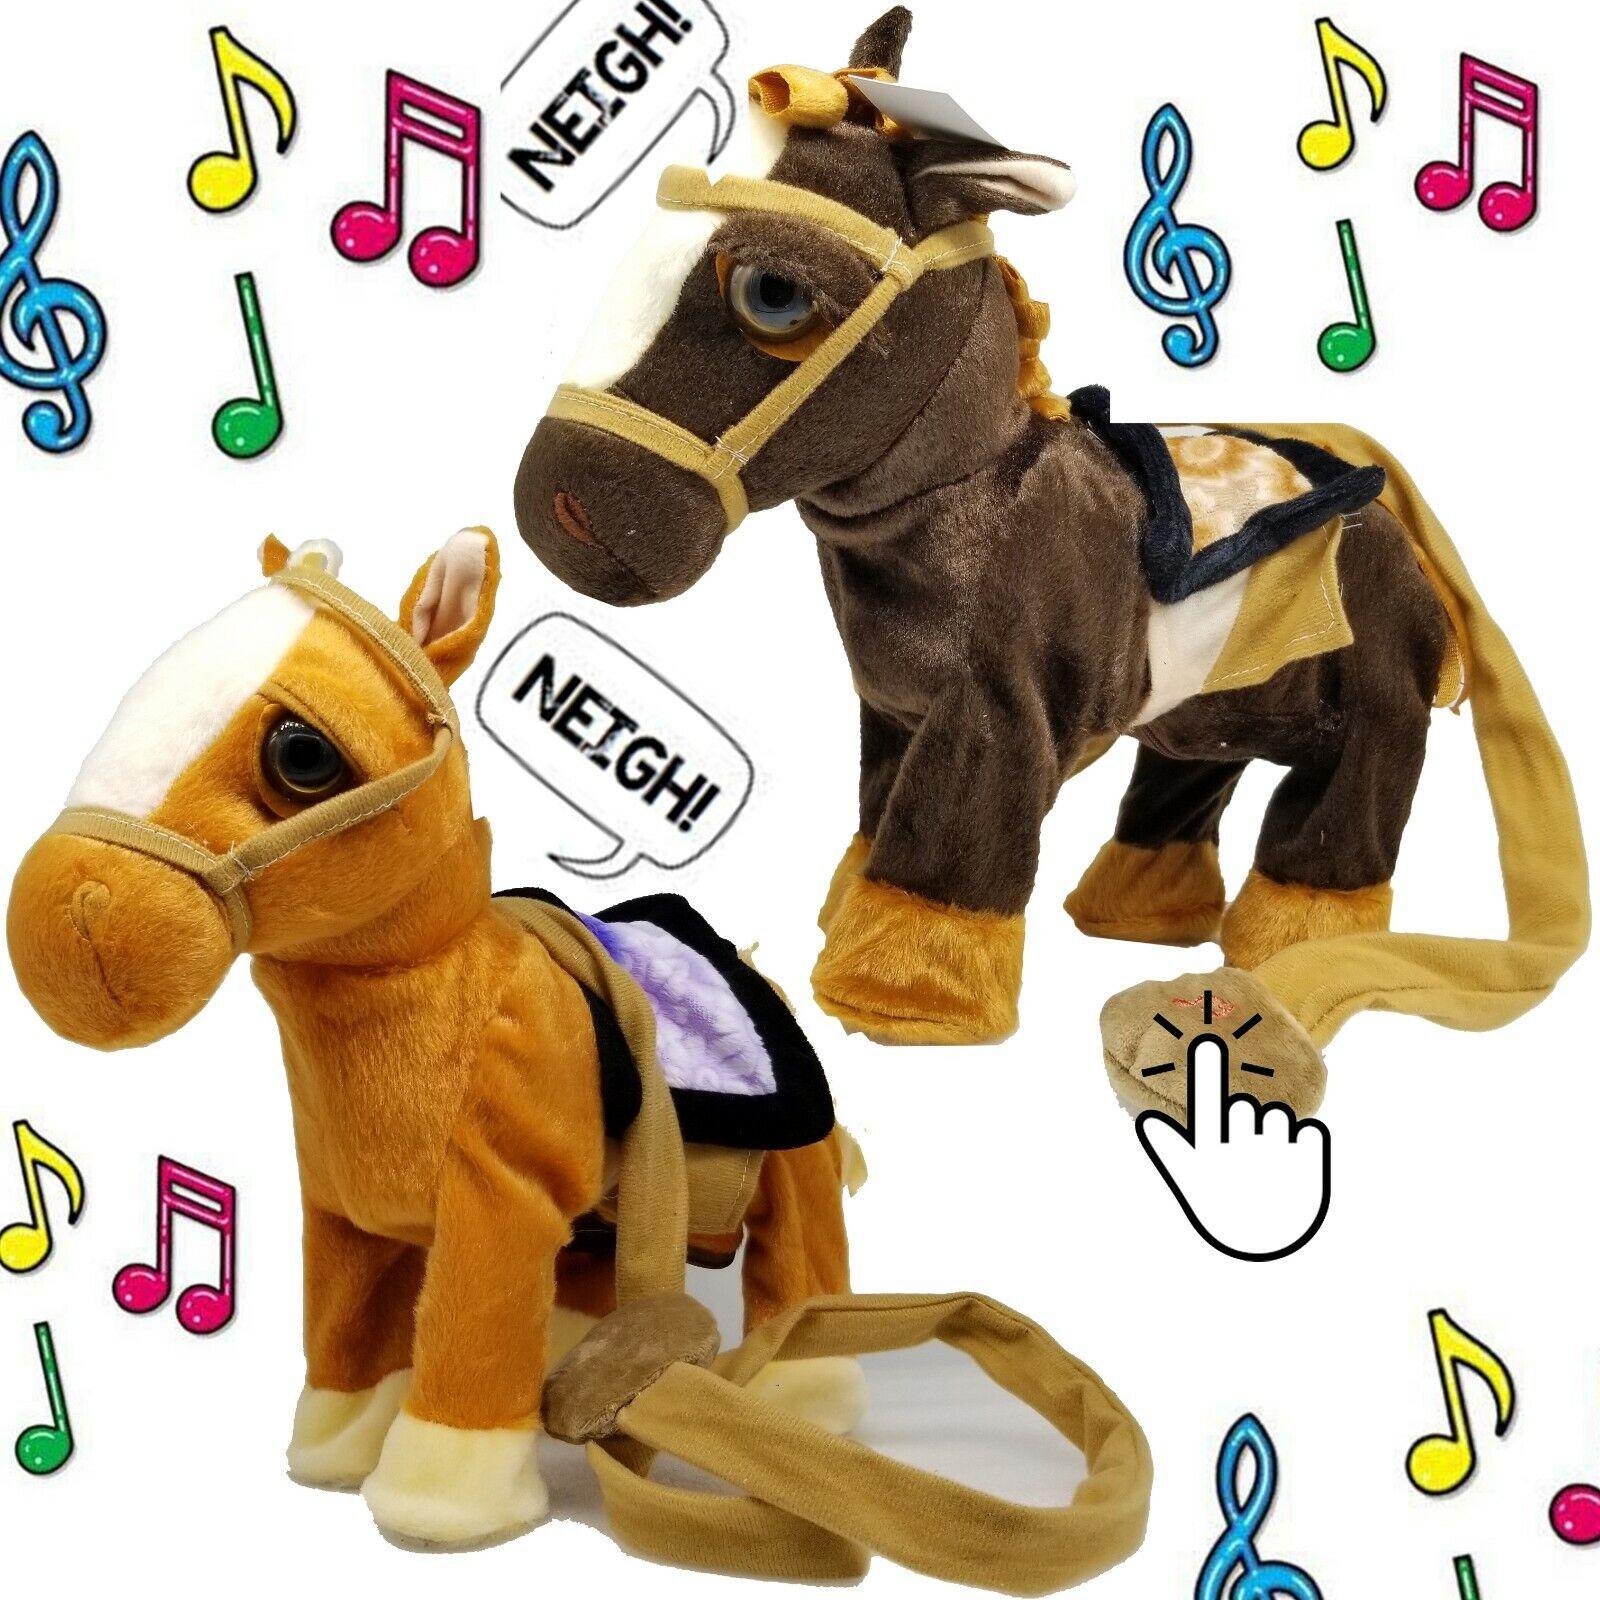 Magic Walking Singing Unicorn Plush Toy Doll For Children Kids Birthday Gifts UK